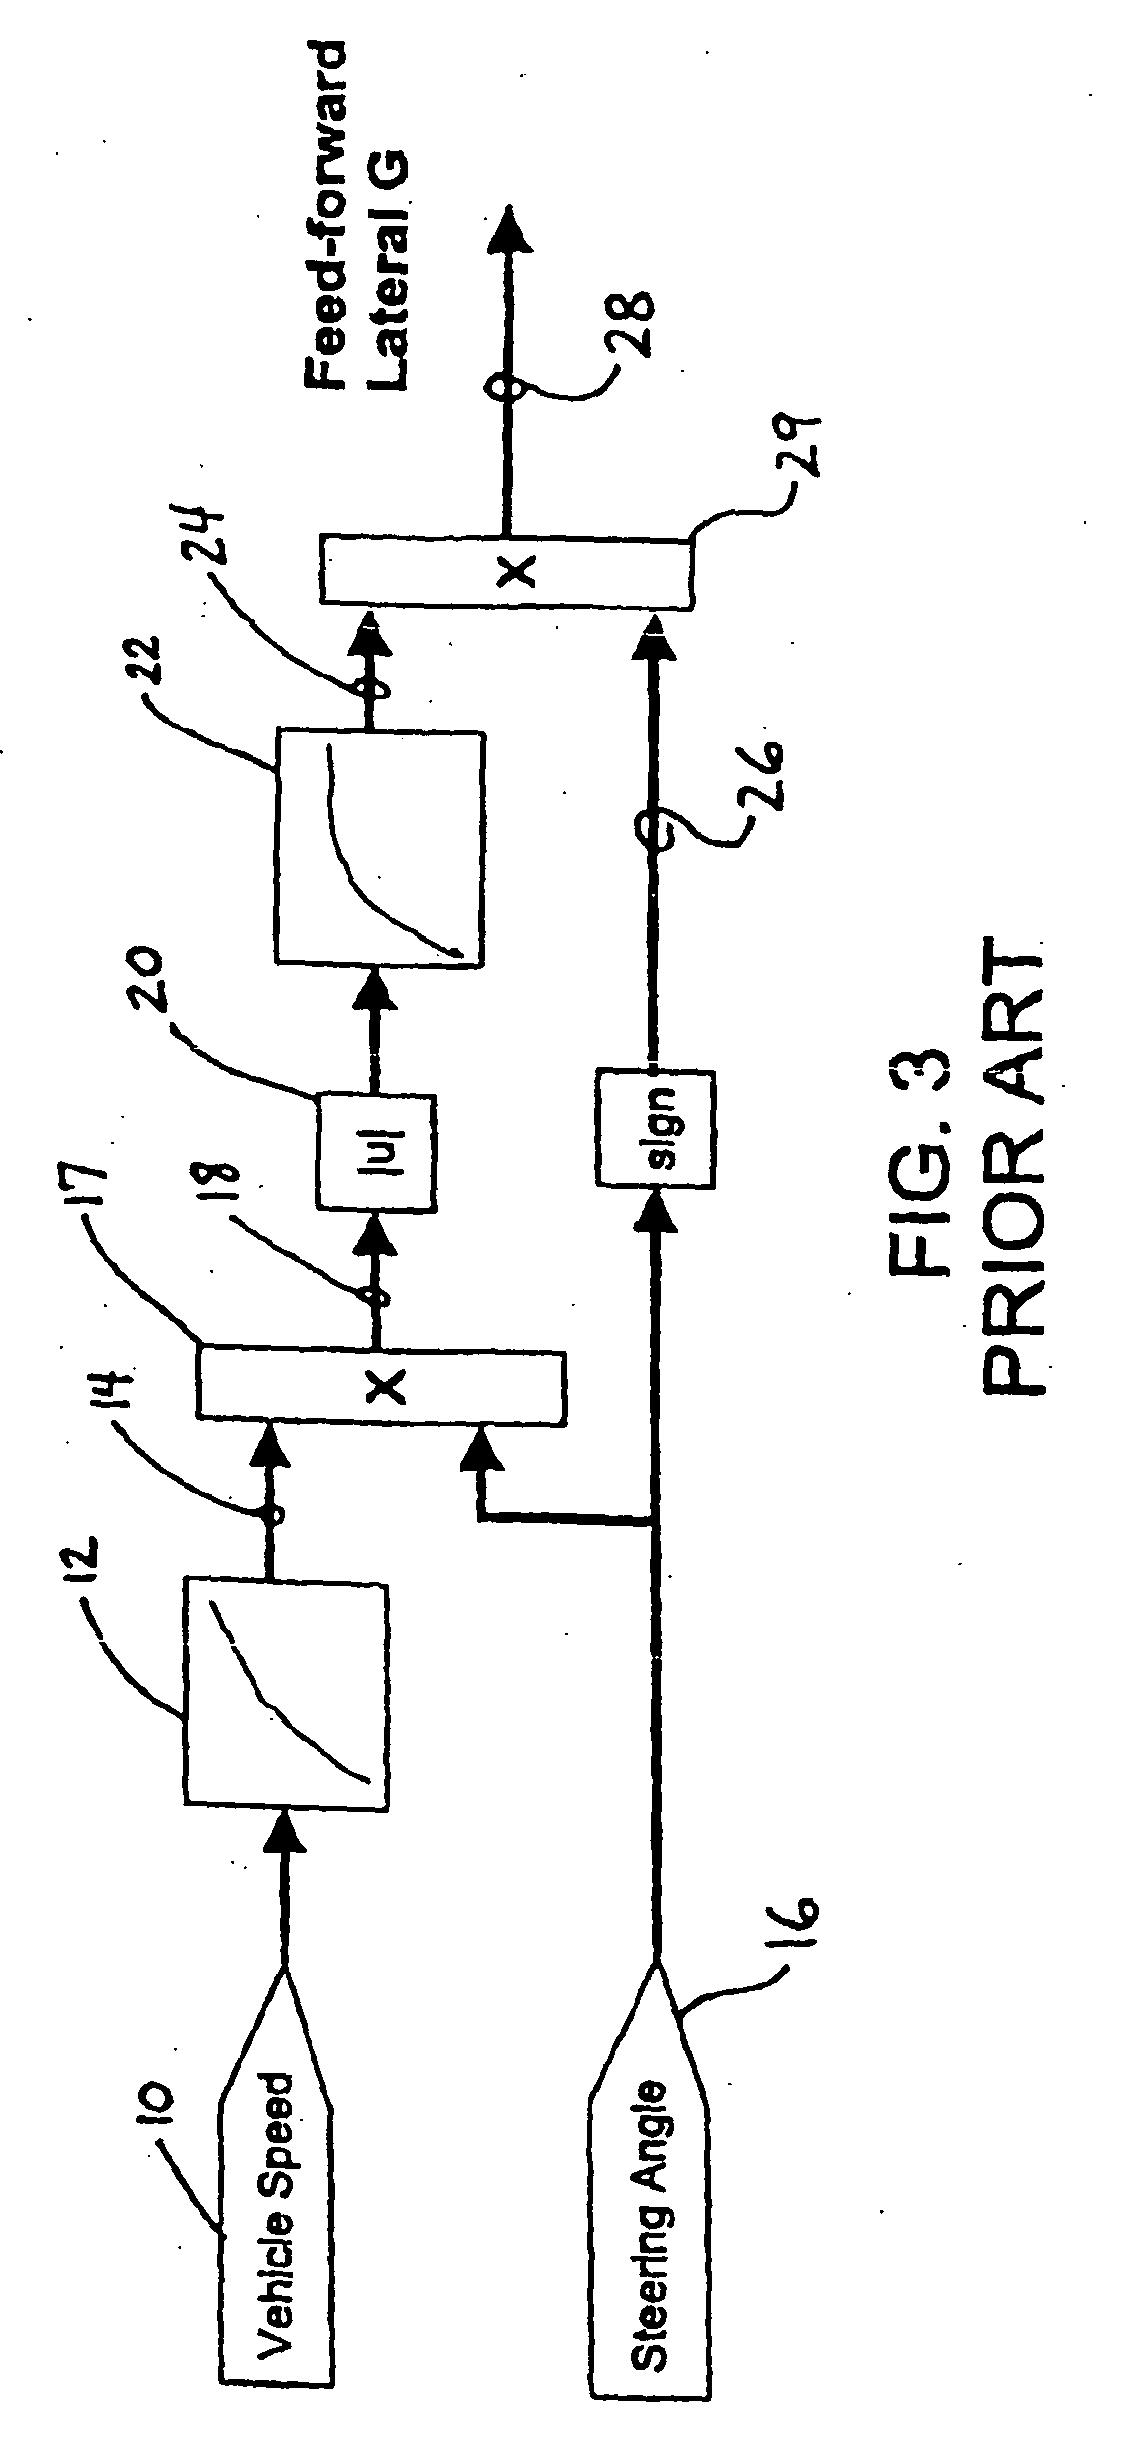 patent ep1652752b1 ackermanwinkel basierte fahrzeug lenkwinkelkorrektur google patentsuche. Black Bedroom Furniture Sets. Home Design Ideas